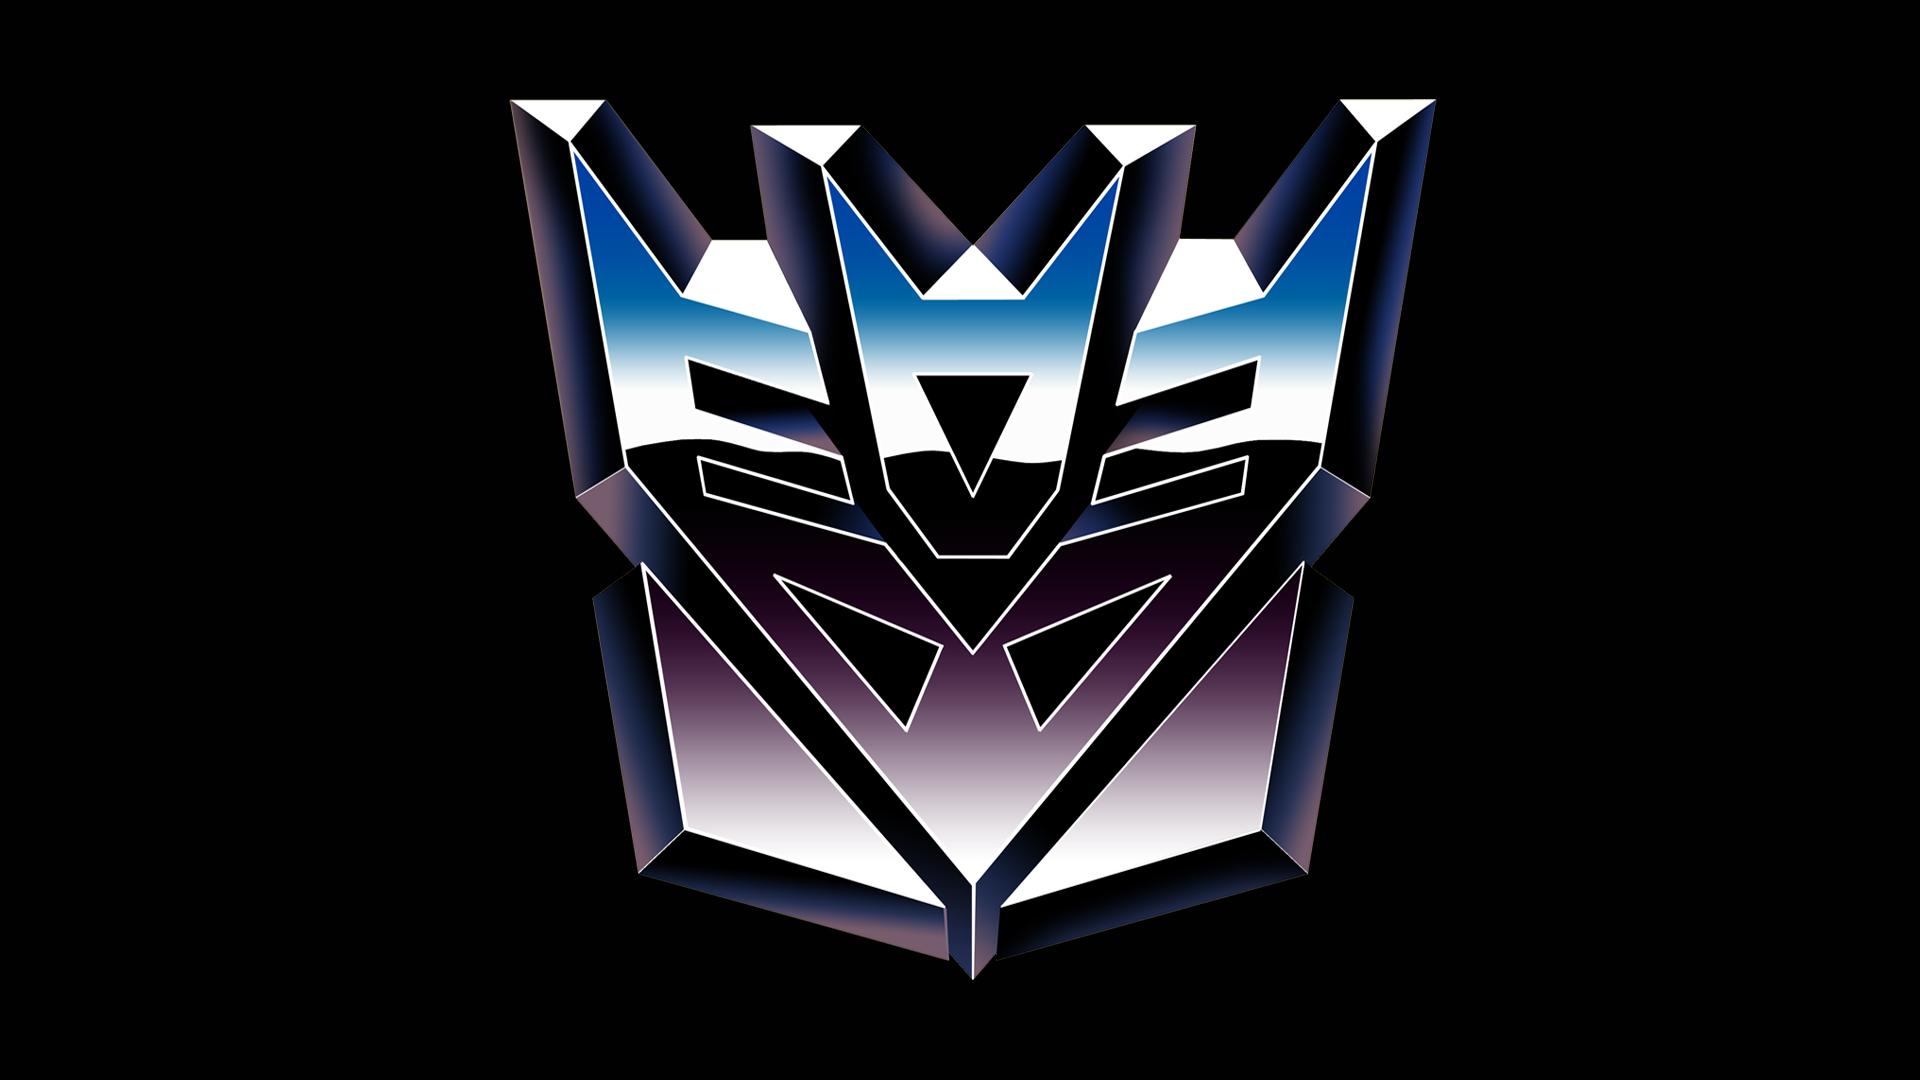 Image Decepticon G1g Teletraan I The Transformers Wiki